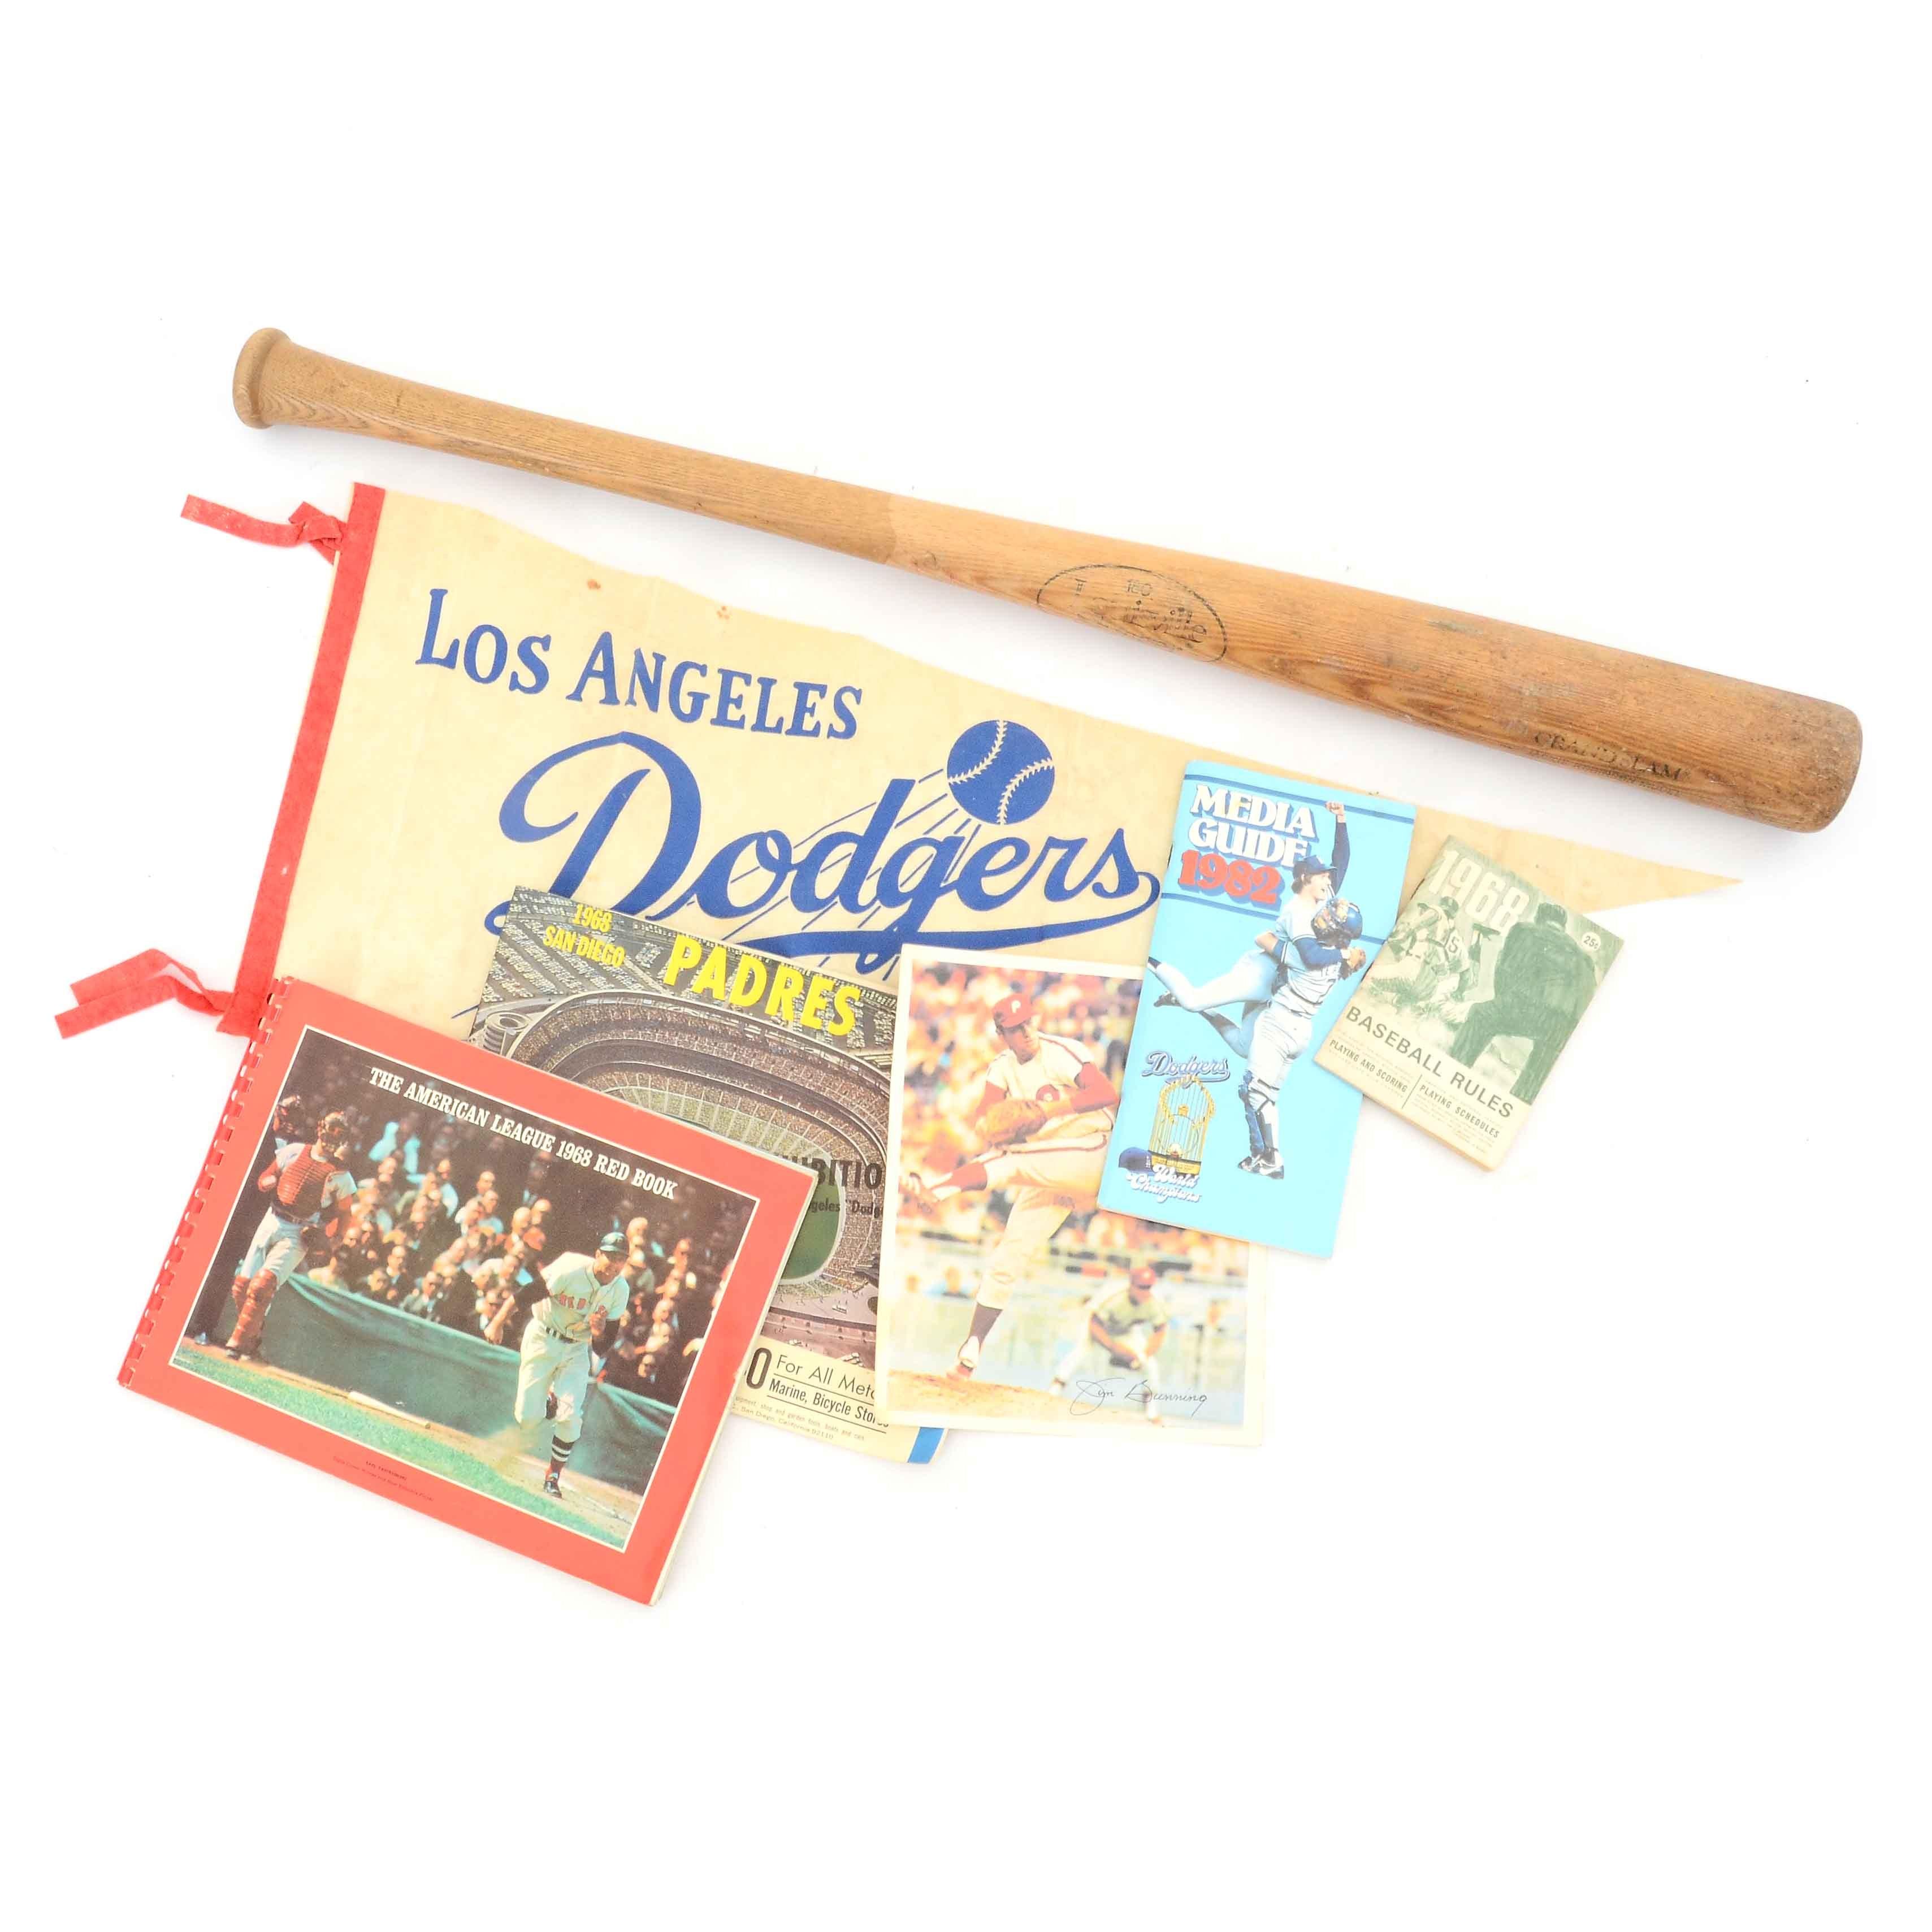 Assorted Vintage Baseball Memorabilia